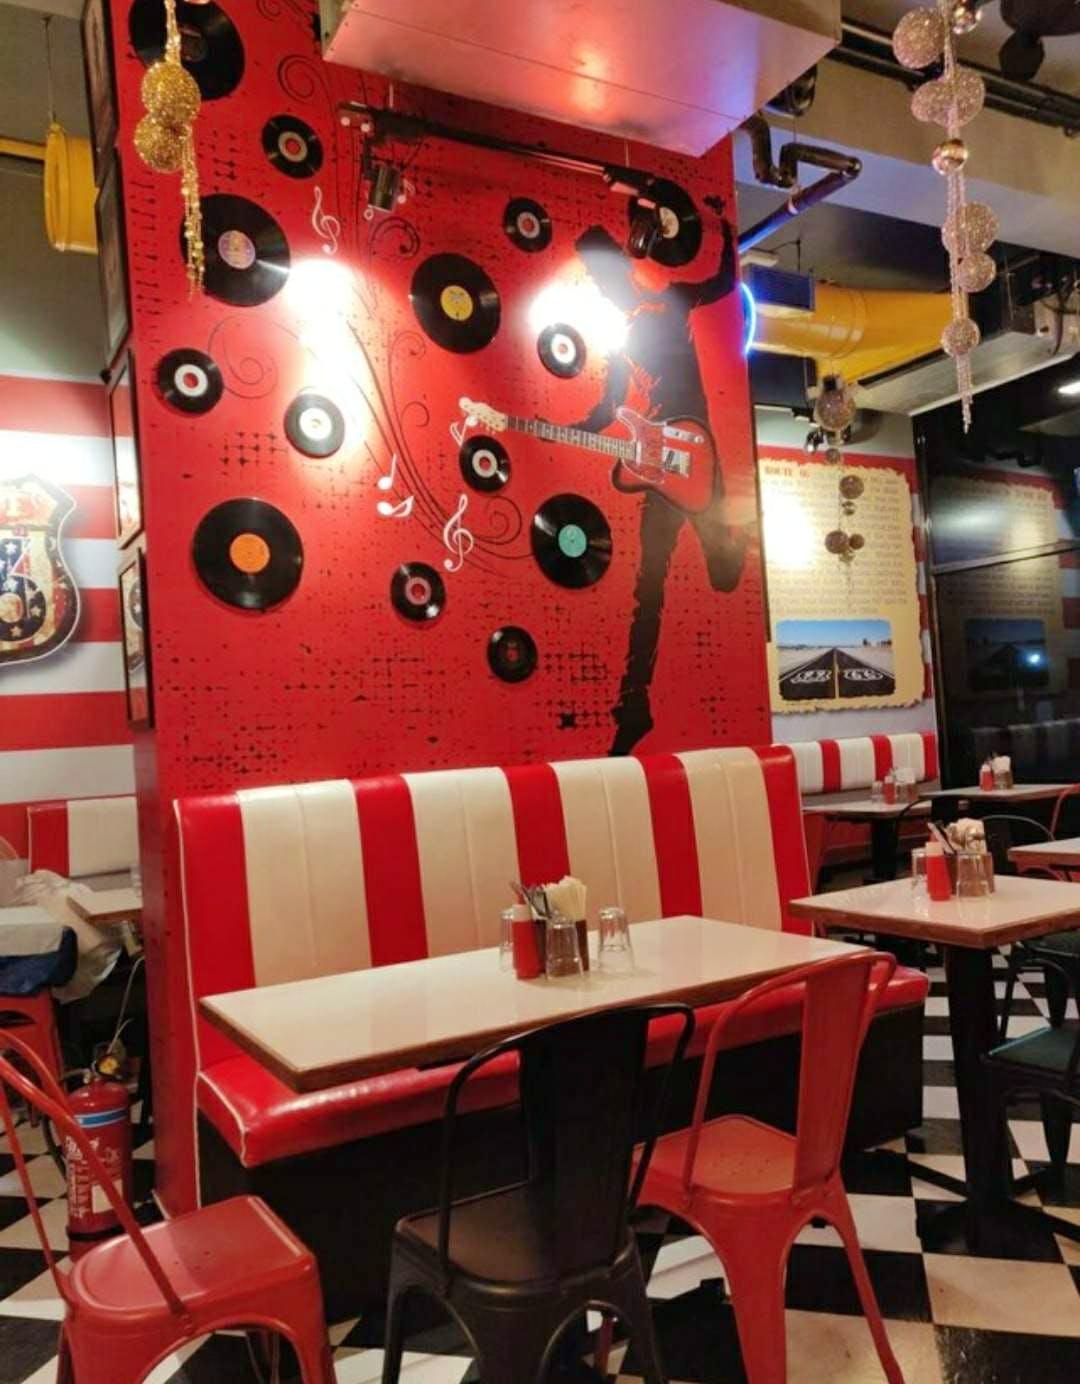 Red,Restaurant,Room,Interior design,Table,Furniture,Building,Architecture,Ceiling